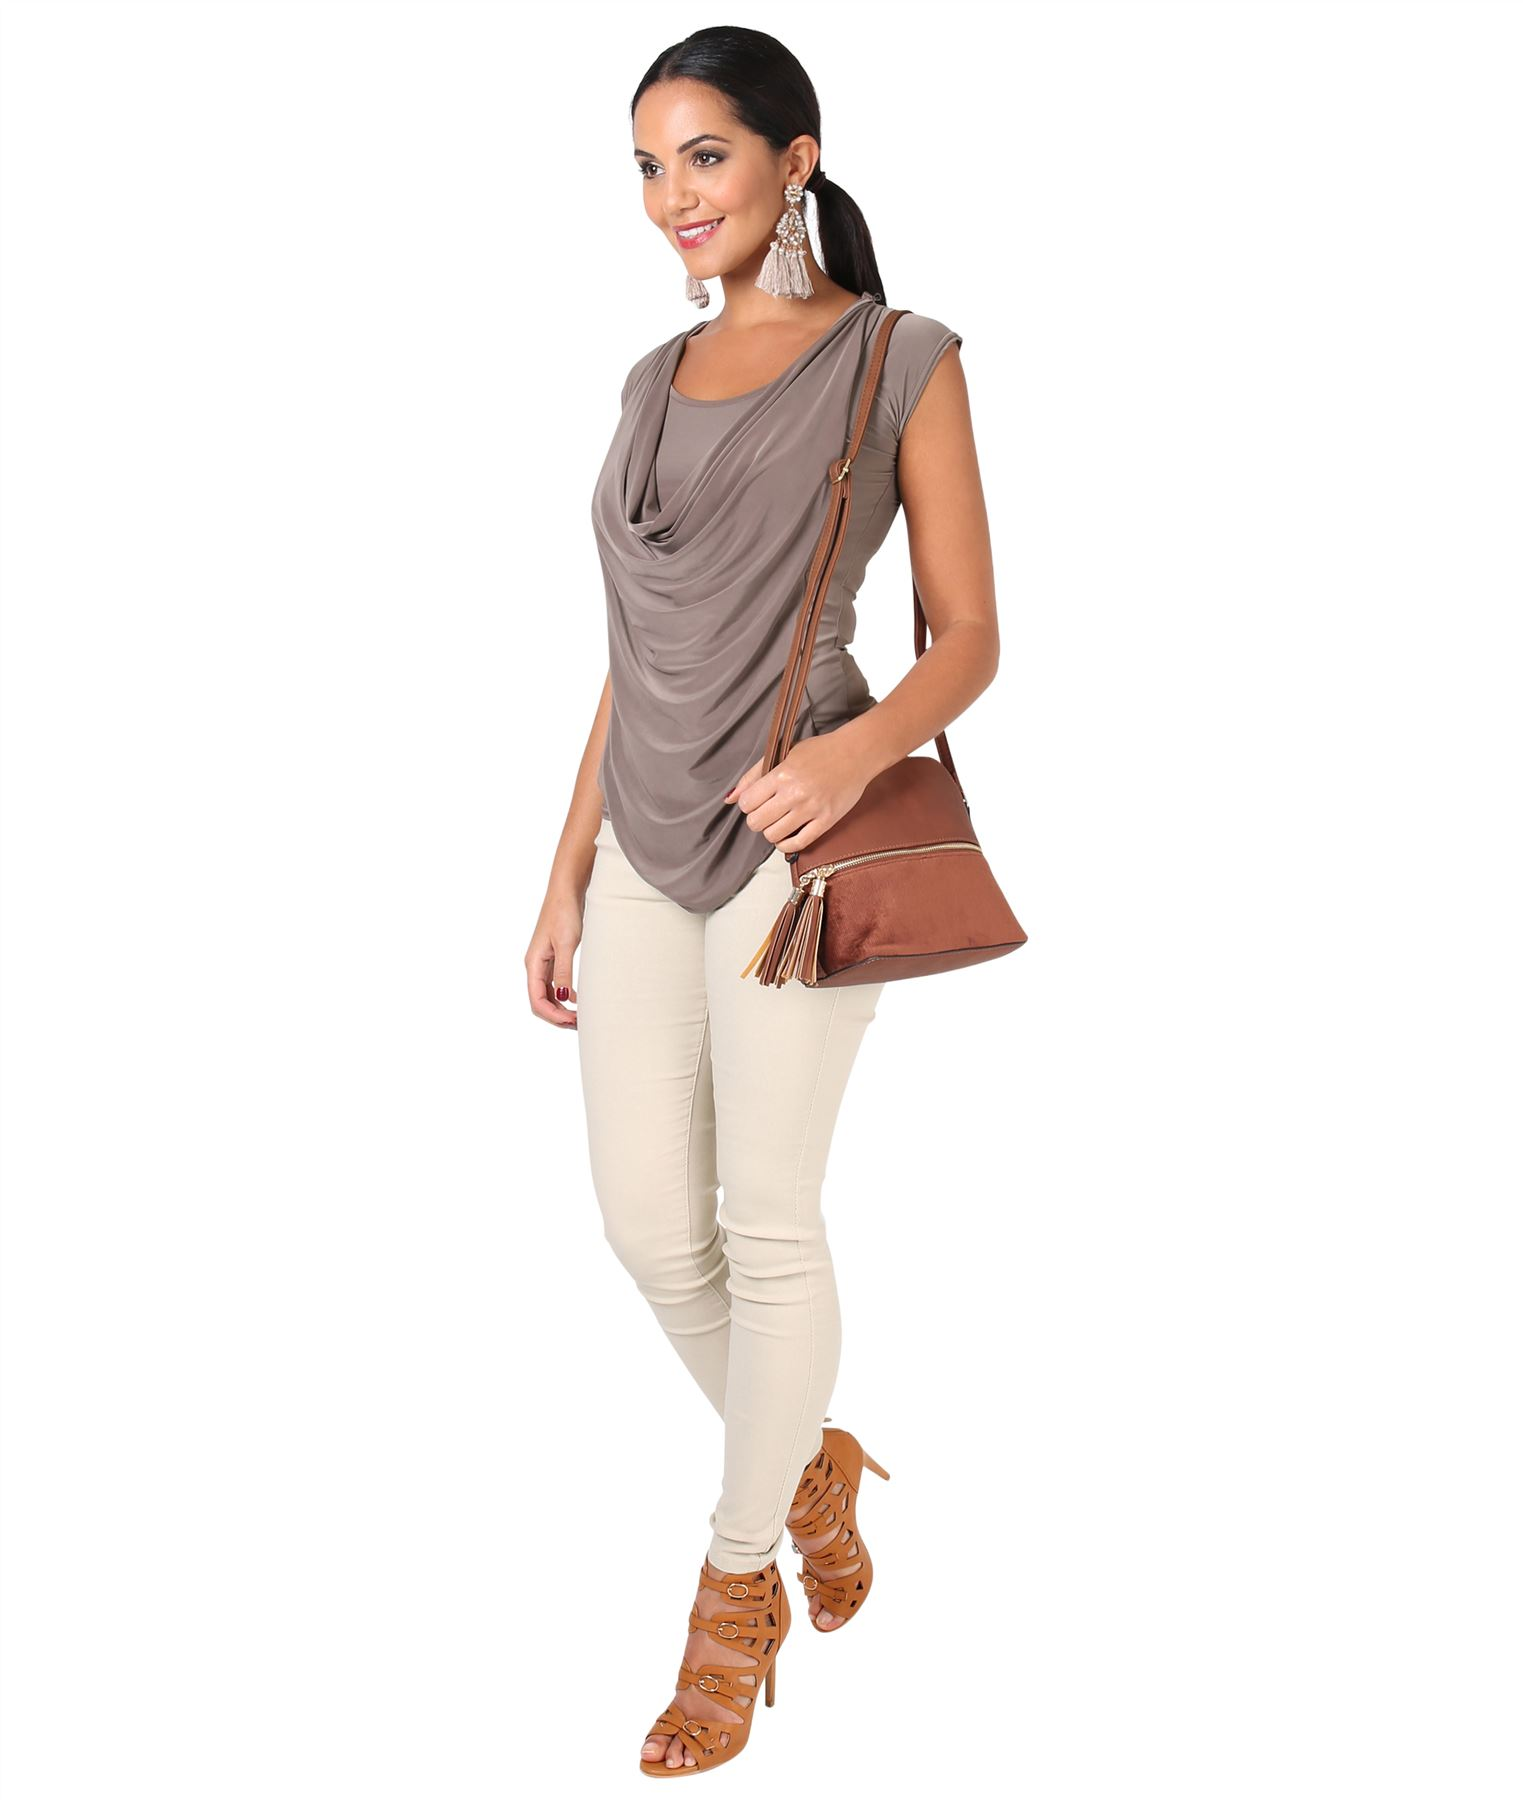 Femme-Top-Haut-Soiree-Decollete-N-ud-Dos-Chic-Sexy-Mode-Grande-Taille-Debardeur miniature 11